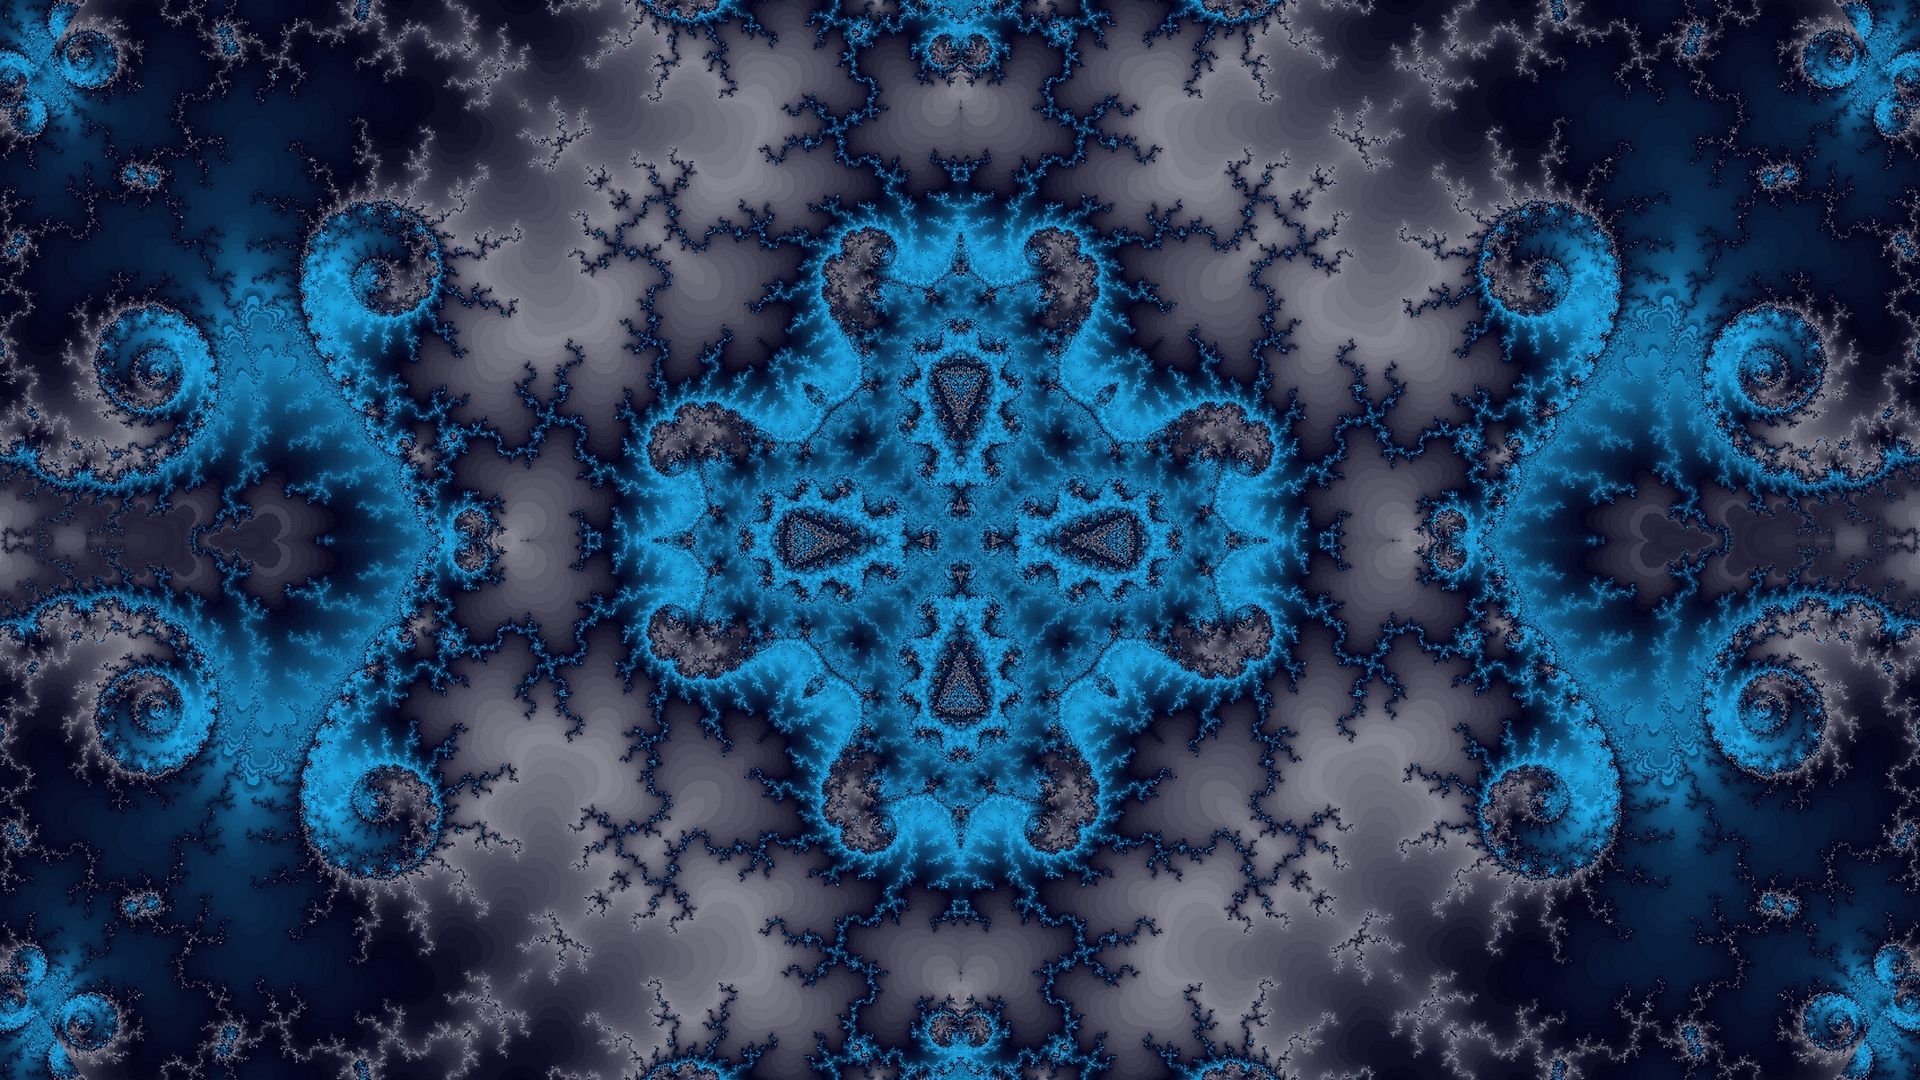 Kaleidoscope wallpaper picture hd